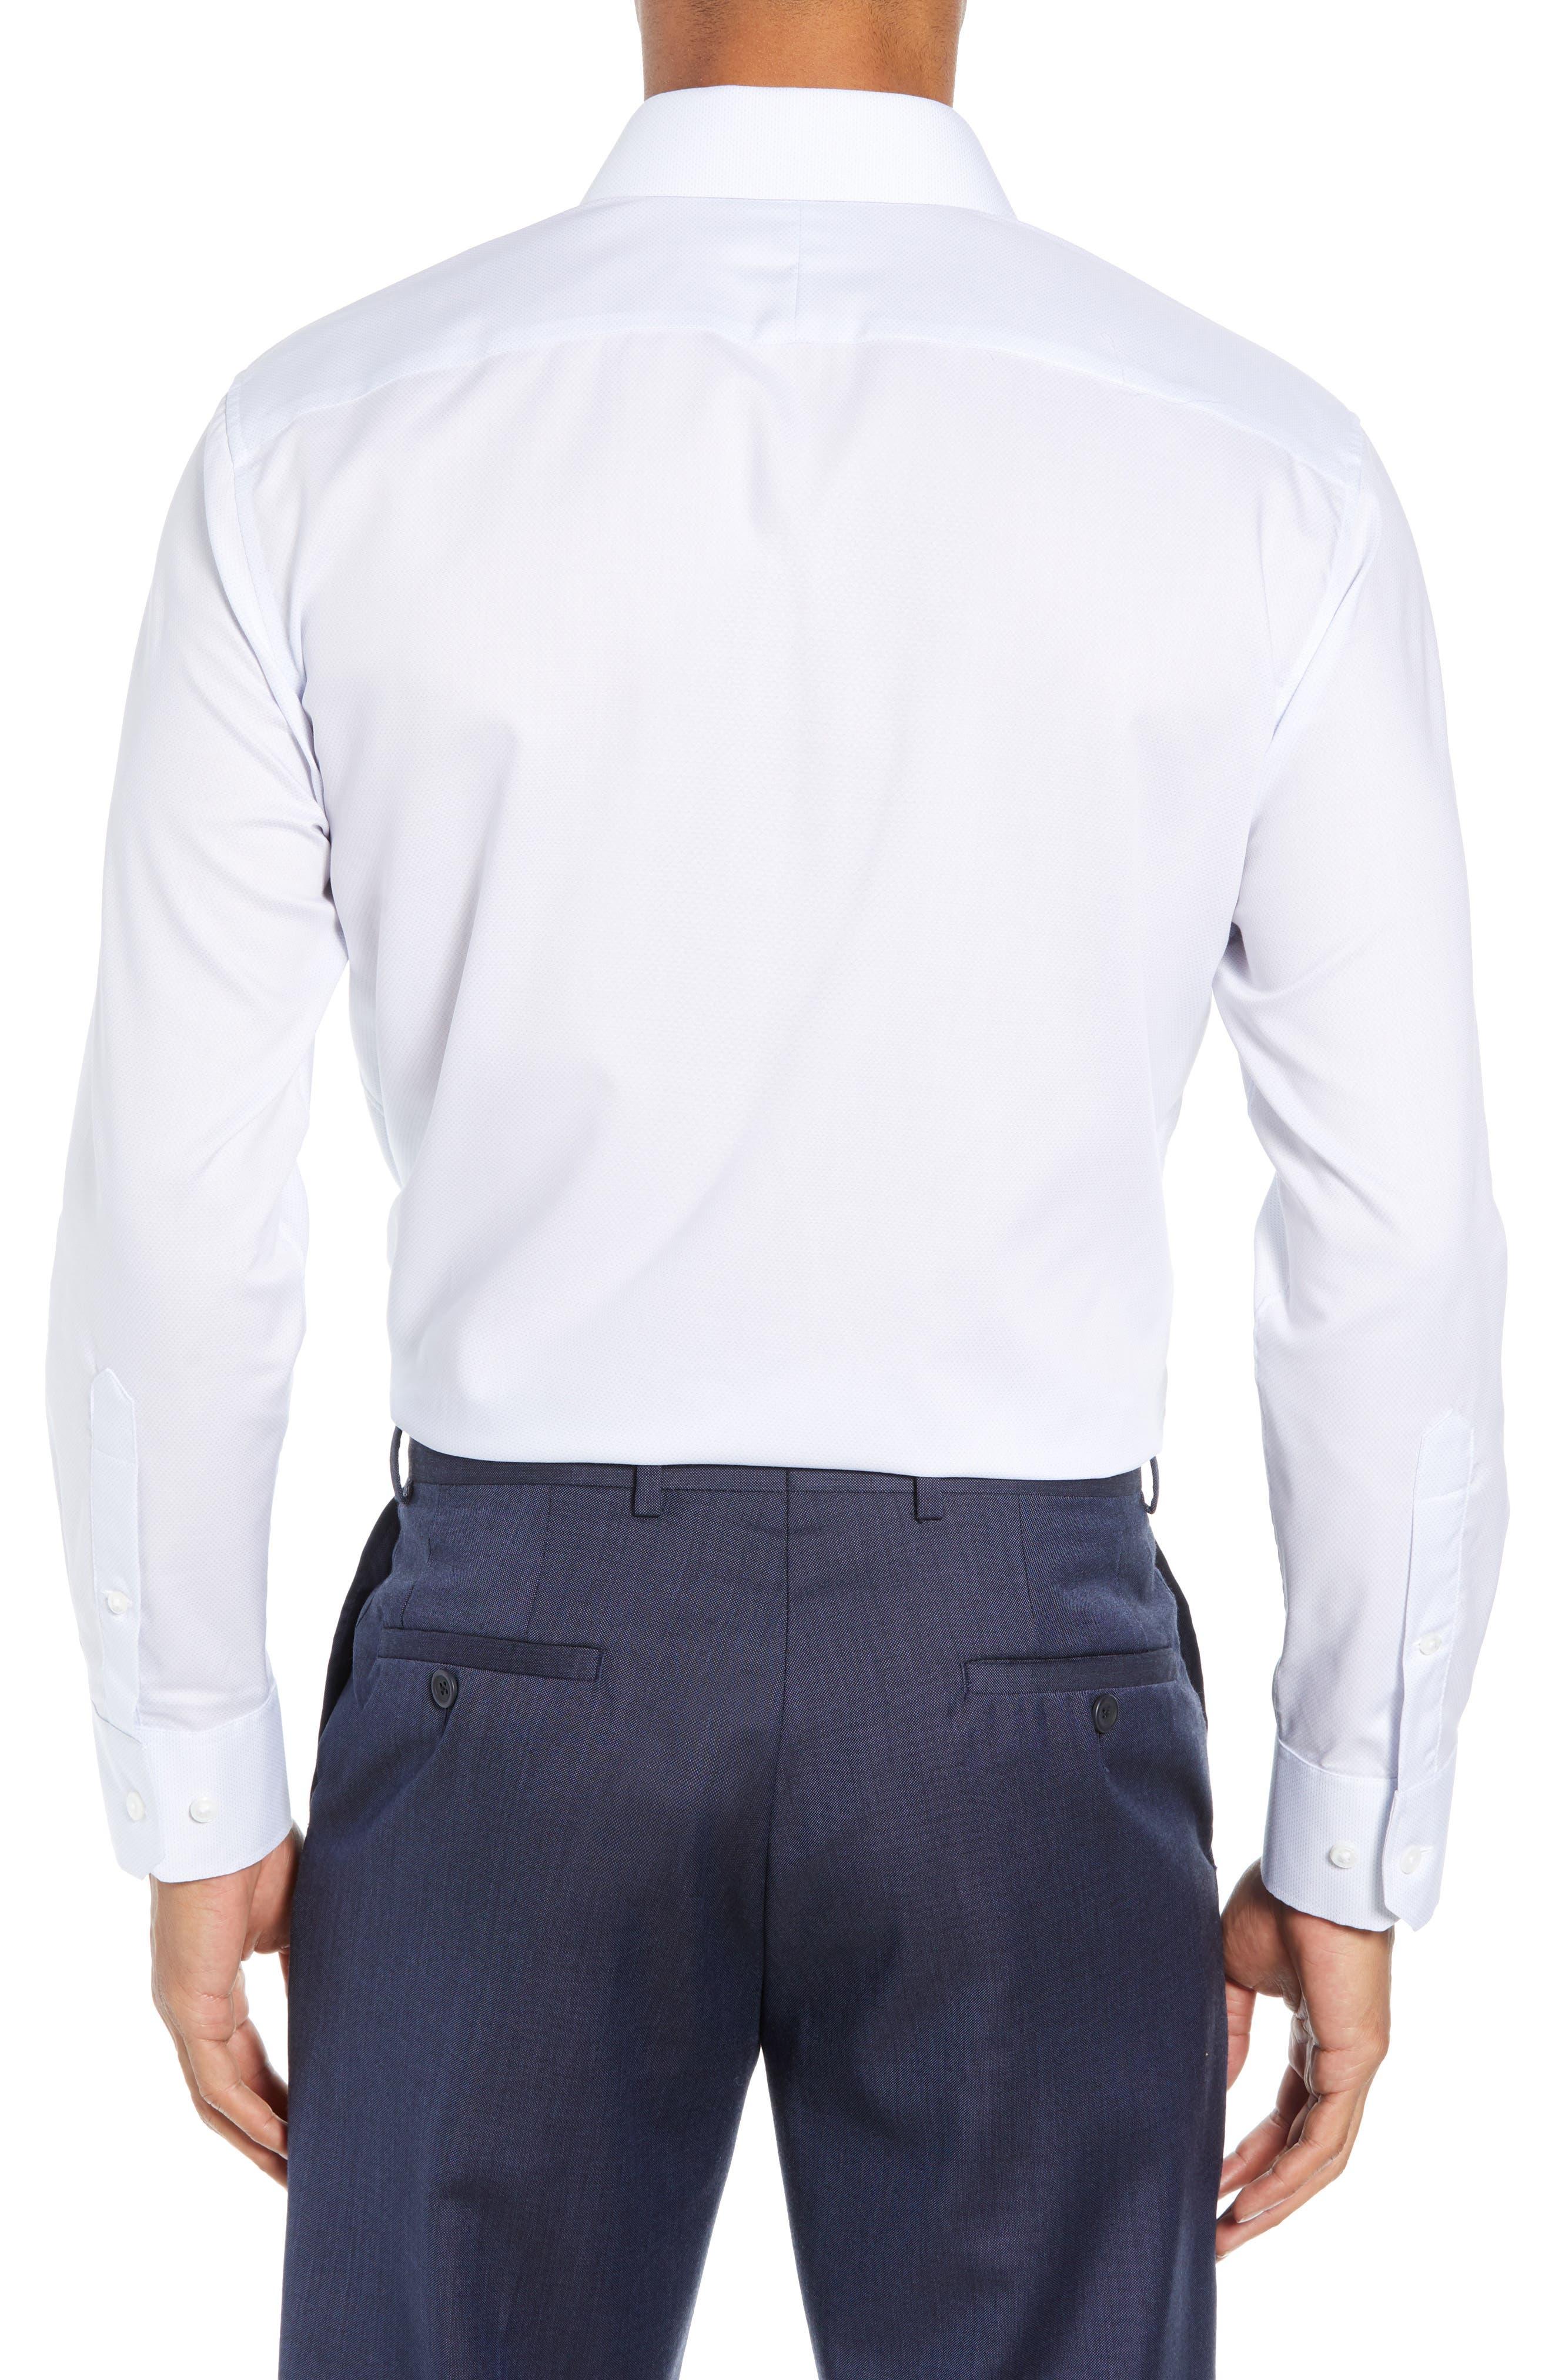 Swiss Performance Slim Fit Solid Dress Shirt,                             Alternate thumbnail 3, color,                             SOFT BLUE